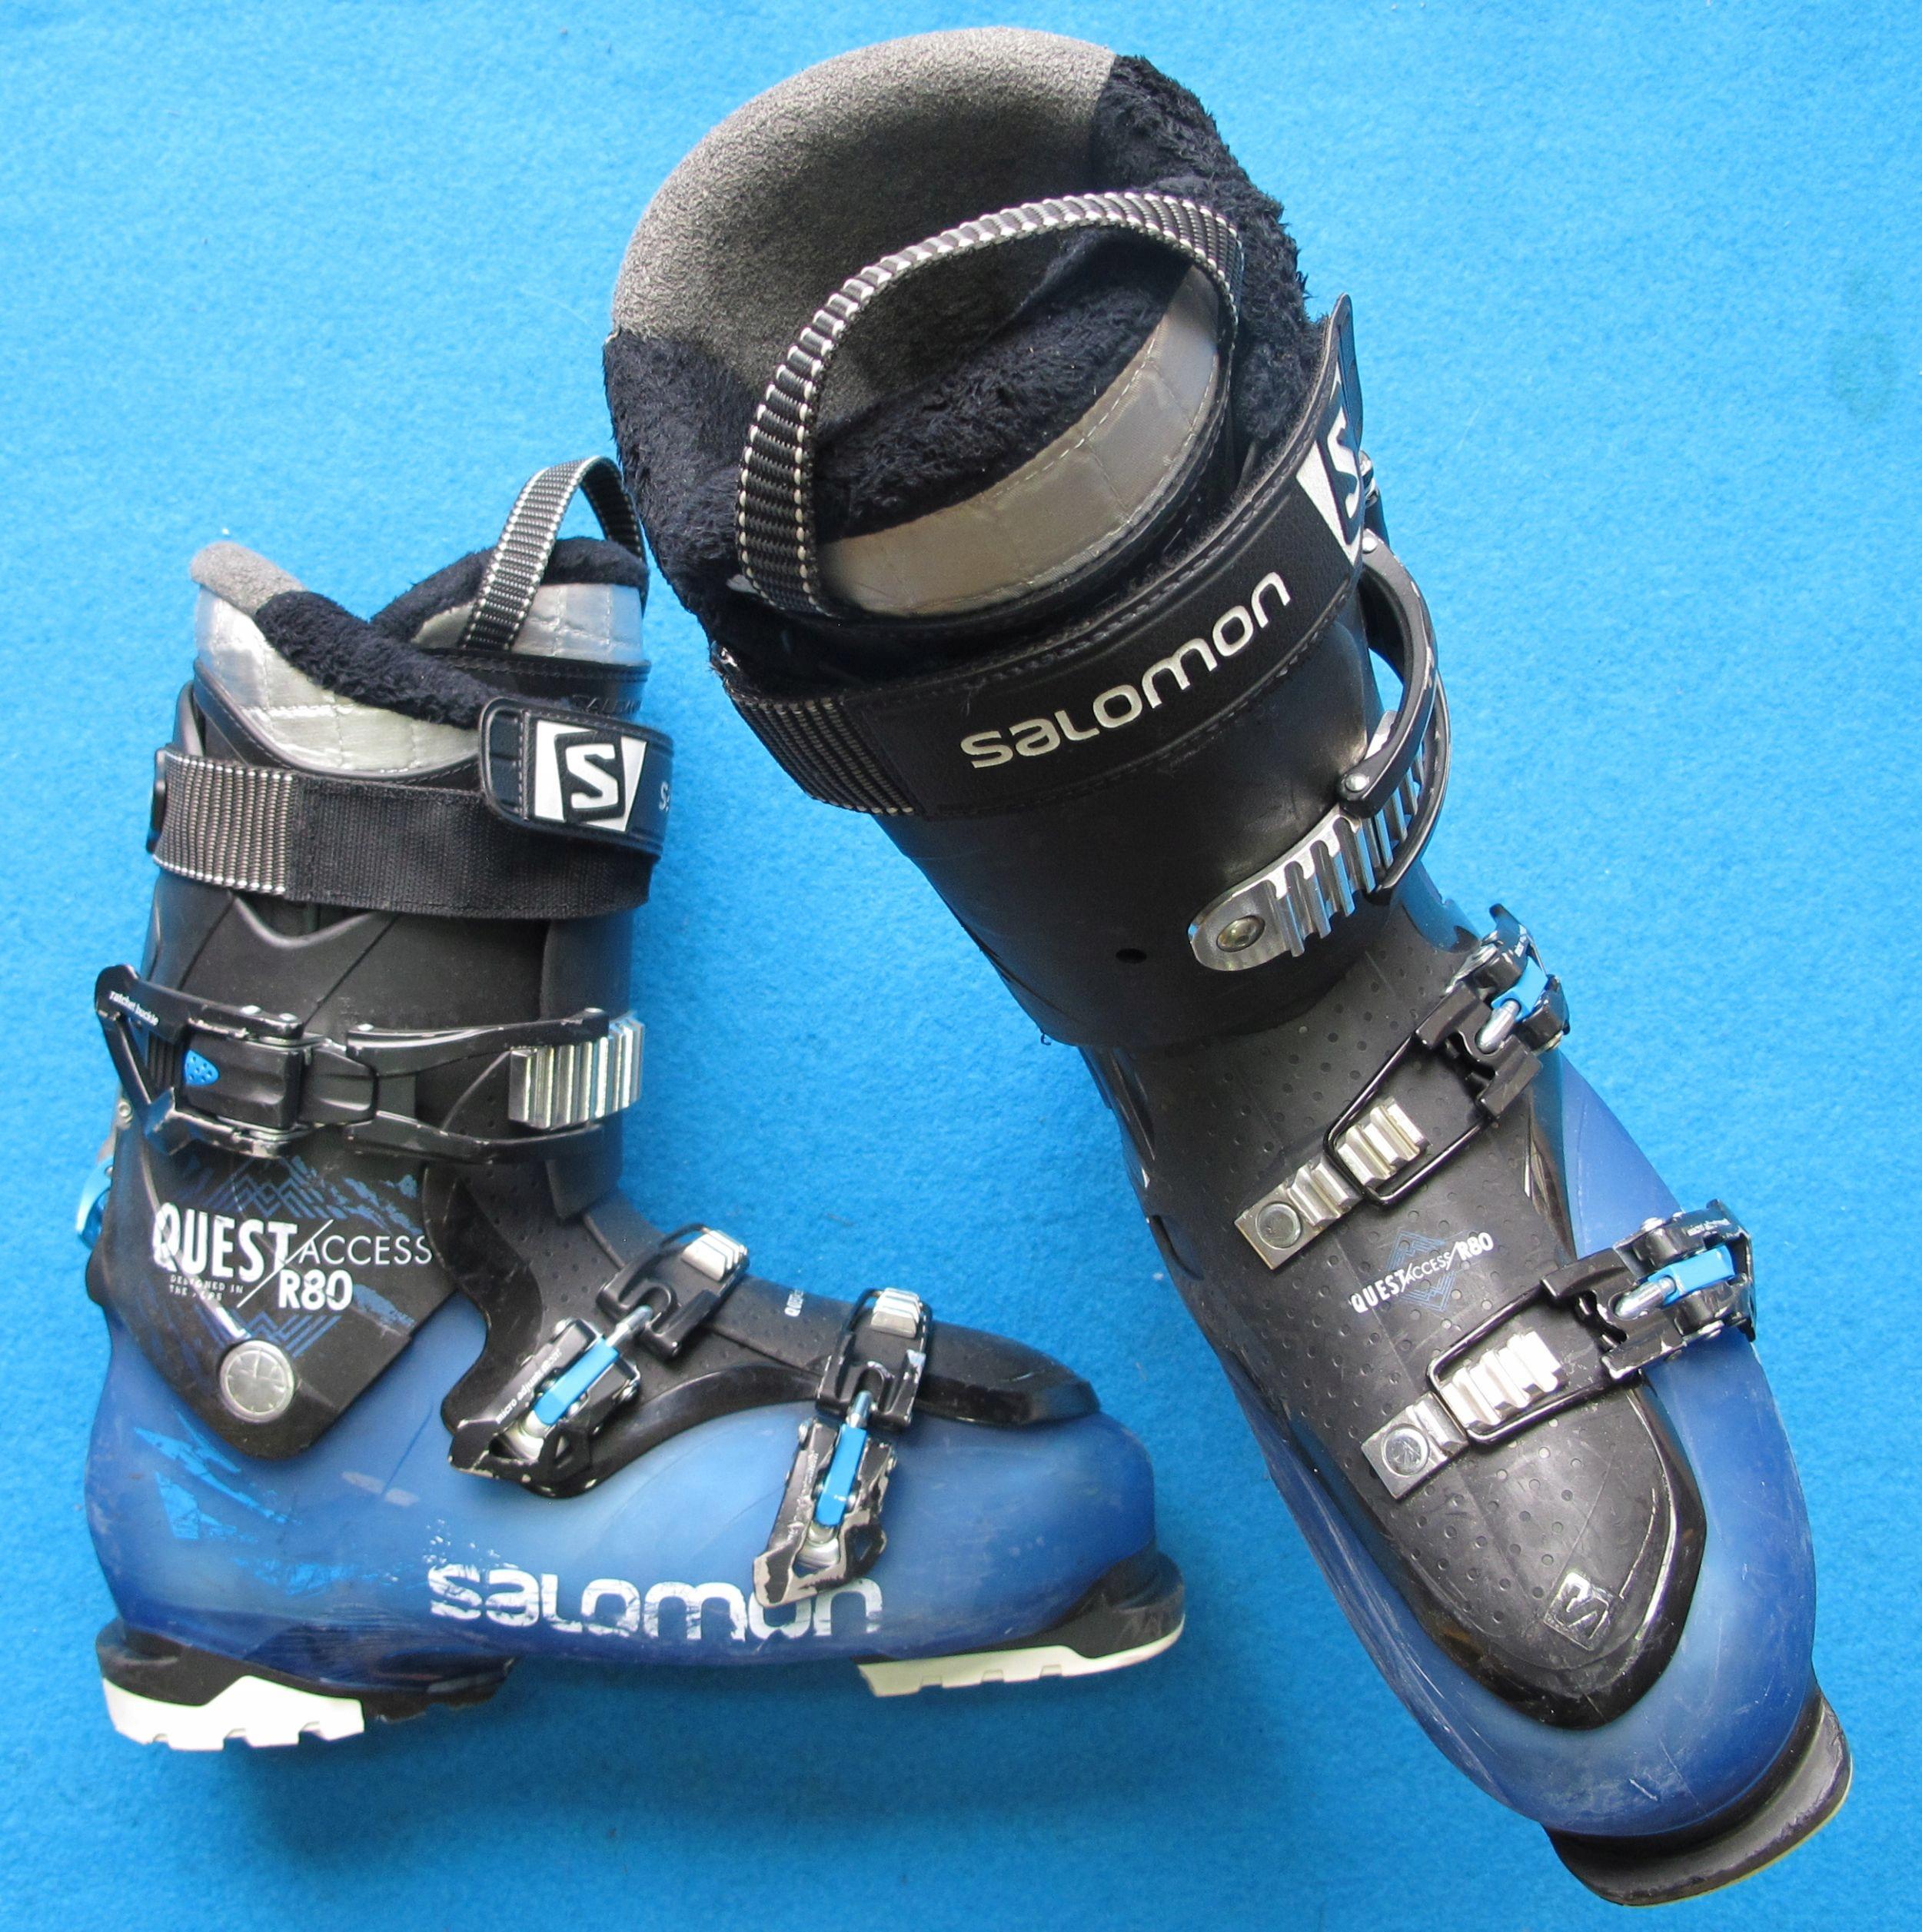 Buty narciarskie SALOMON QUEST ACCESS 80 29,5 46,0